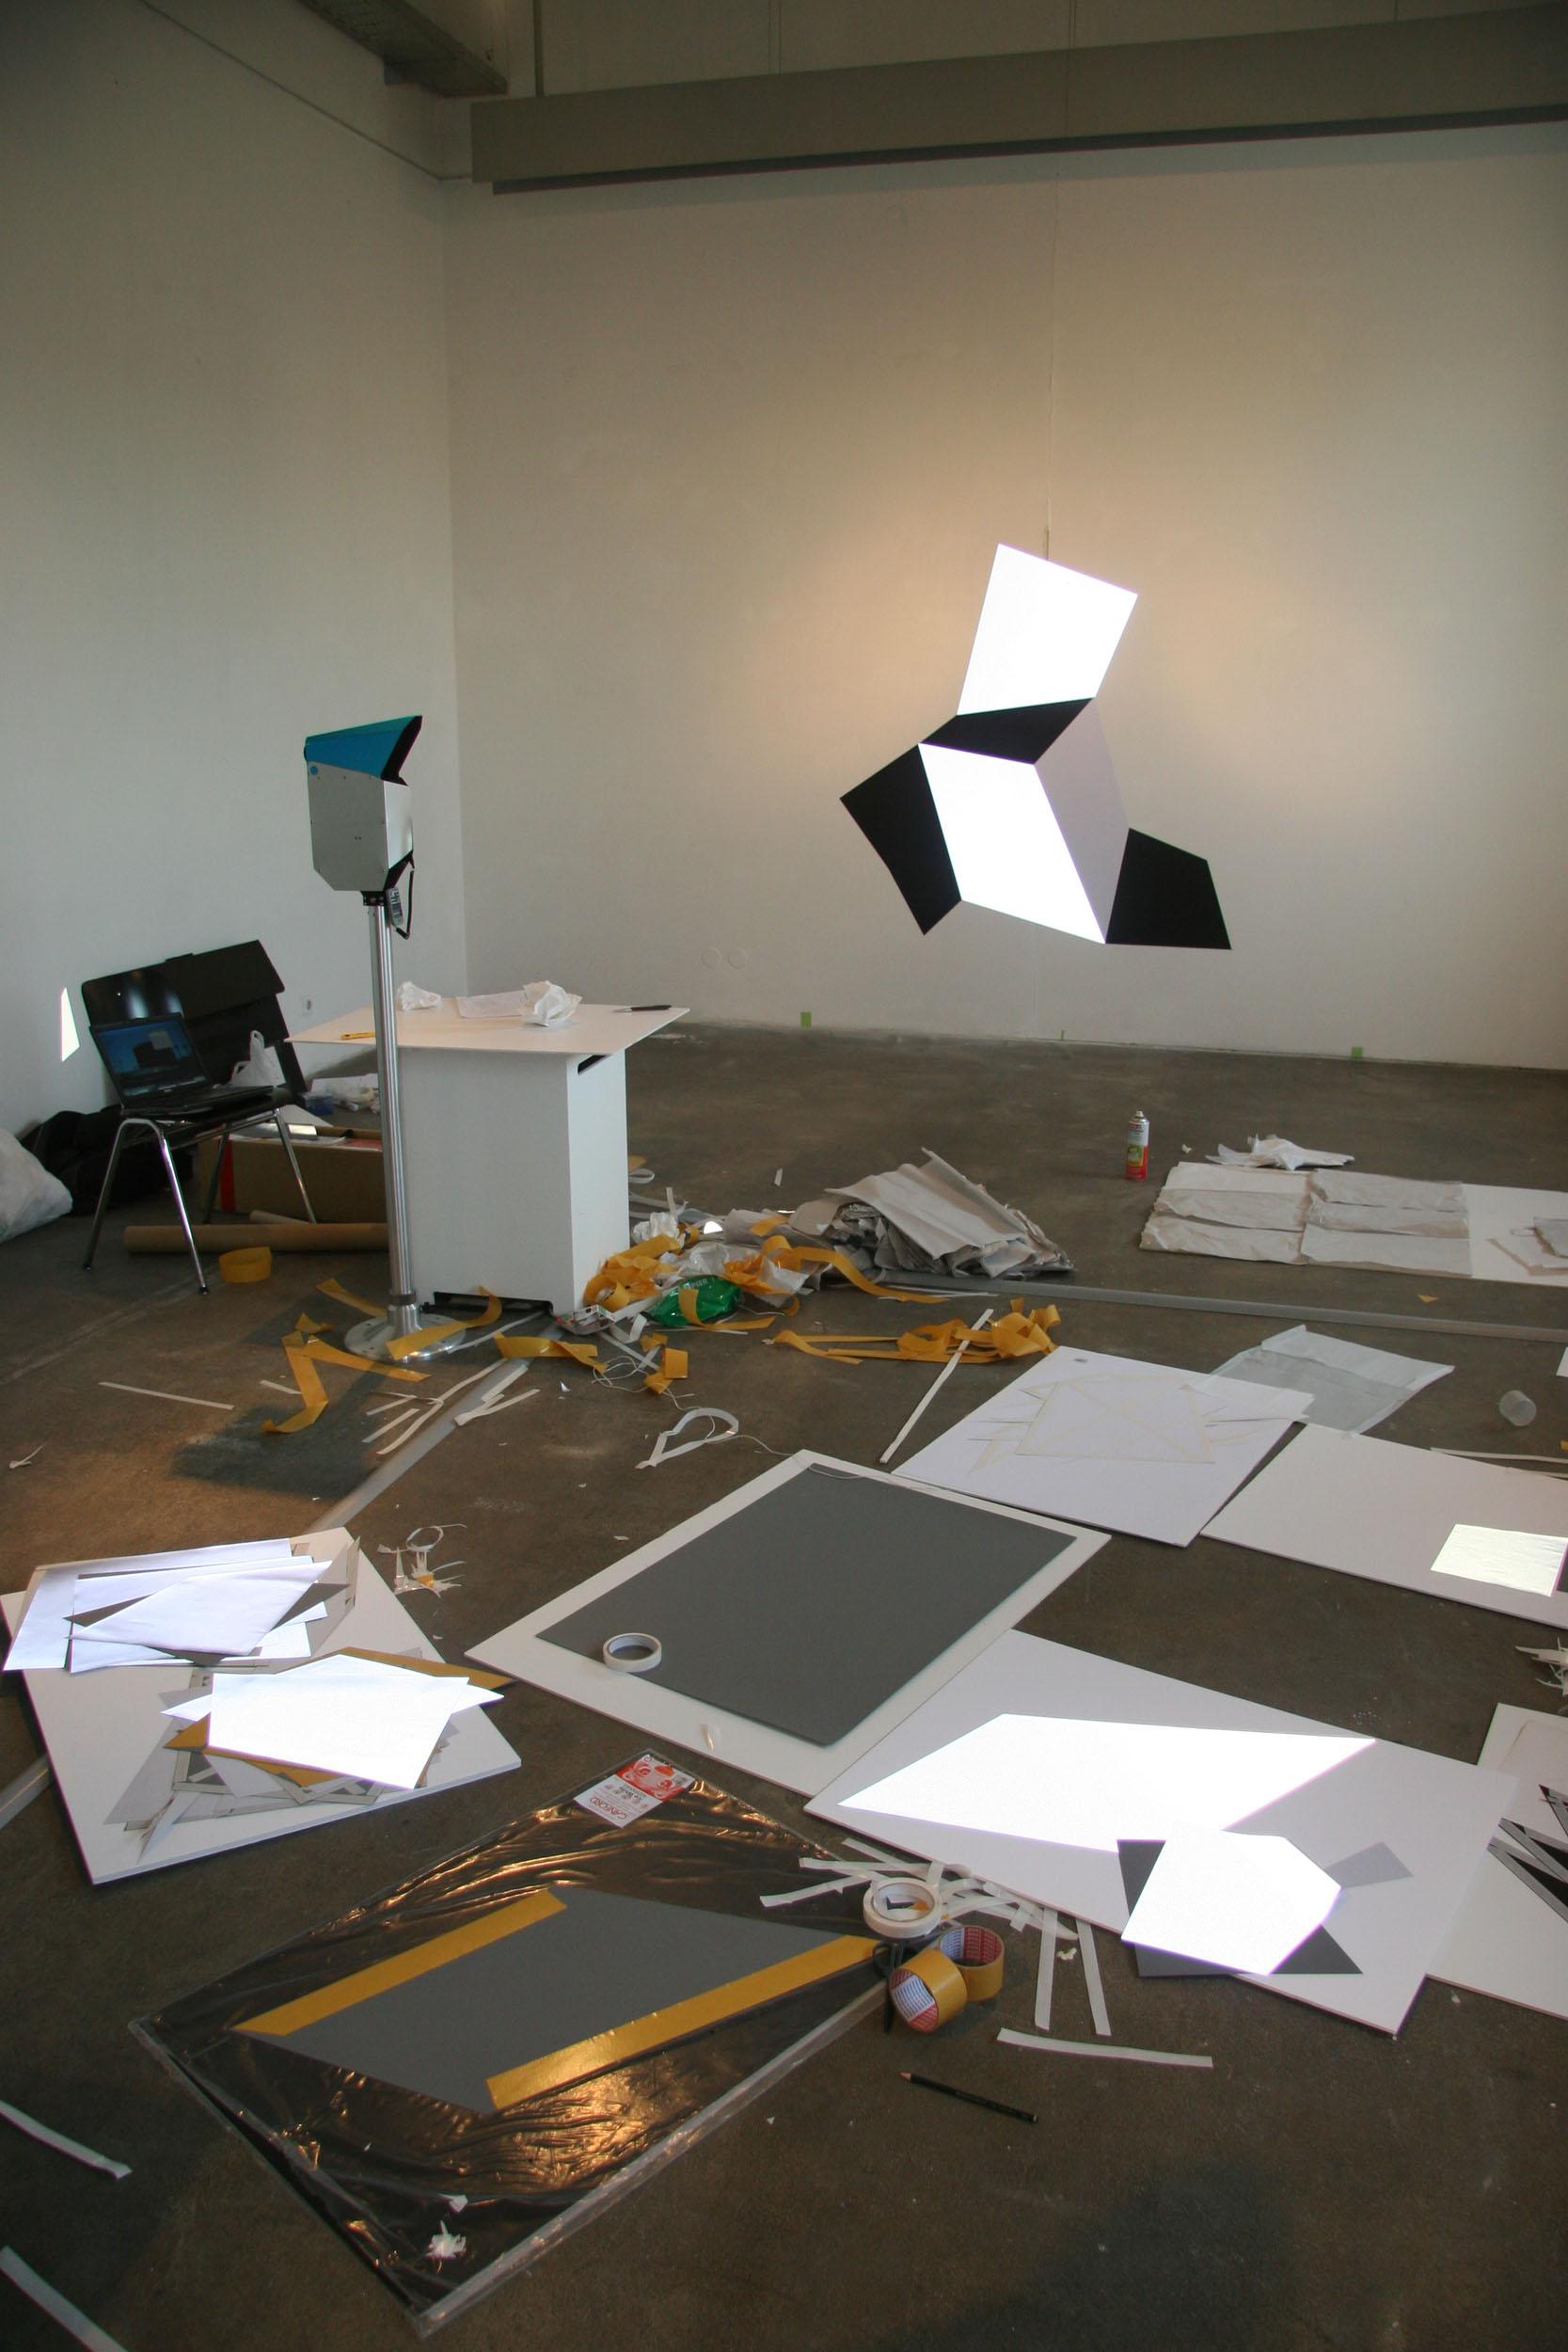 IWI 2008 lightbox image 3.jpg